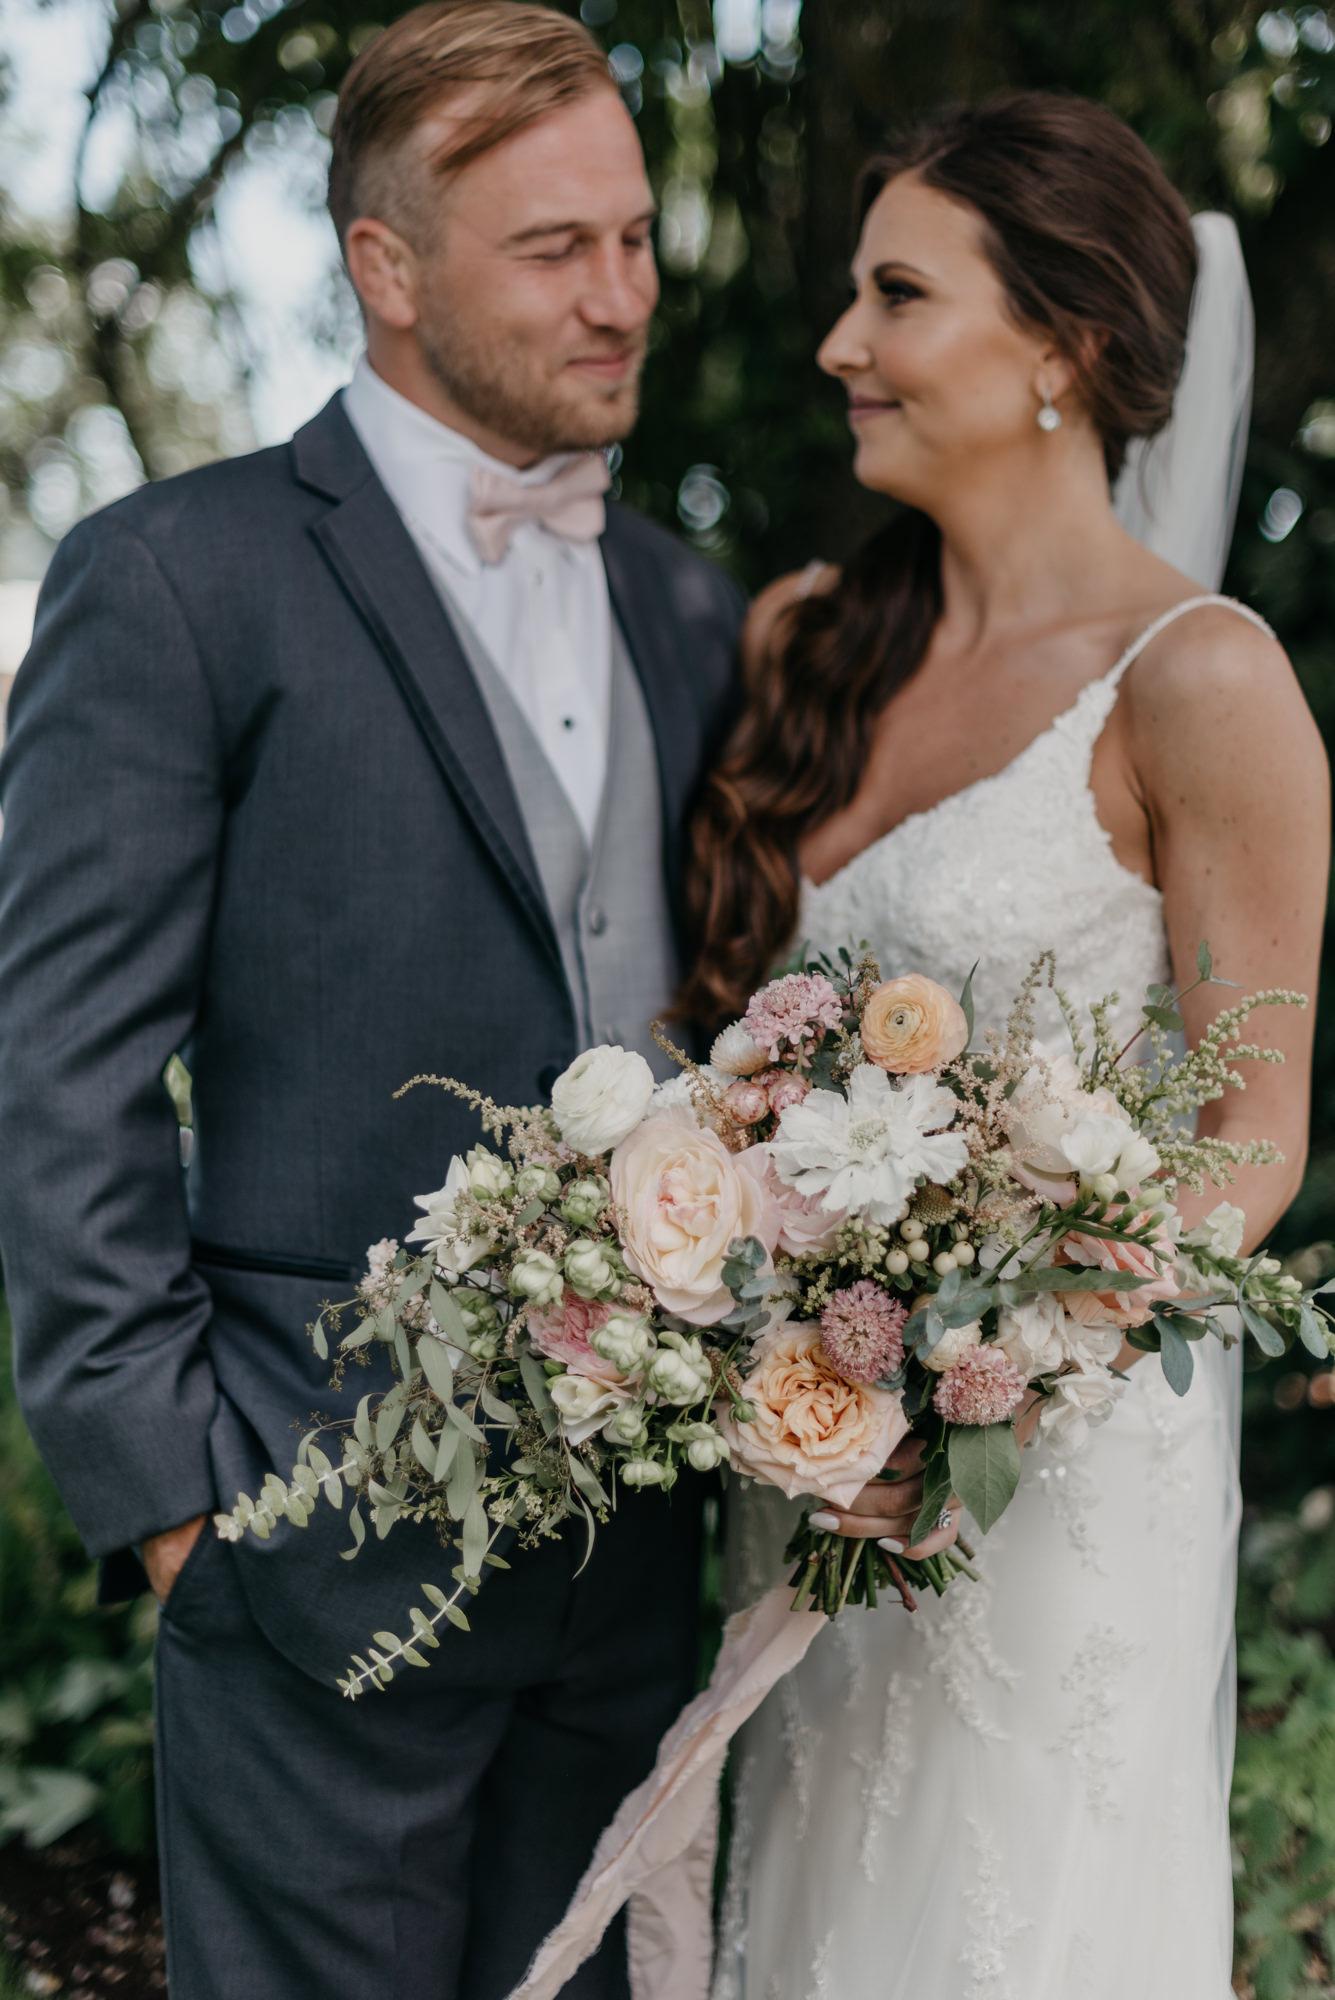 80-lake-oswego-wedding-portland-couple-rose-tree.jpg